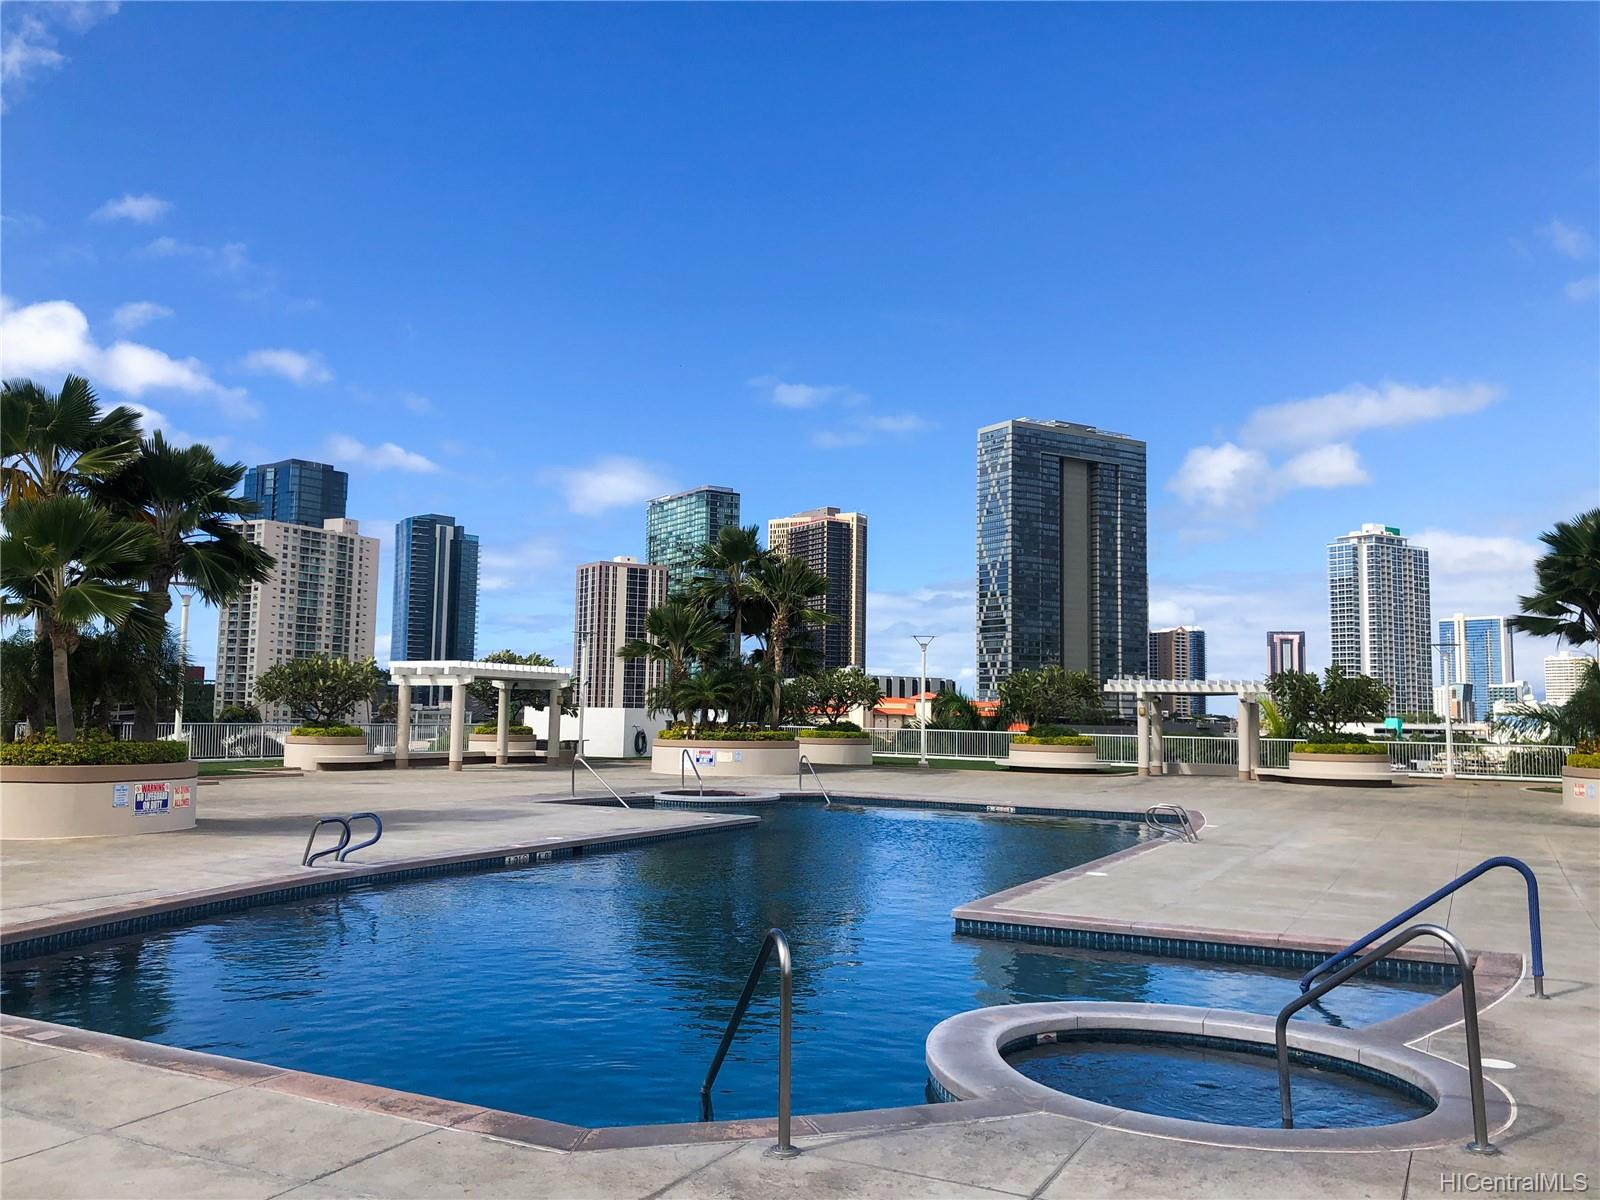 1288 Kapiolani Blvd Honolulu - Rental - photo 22 of 25